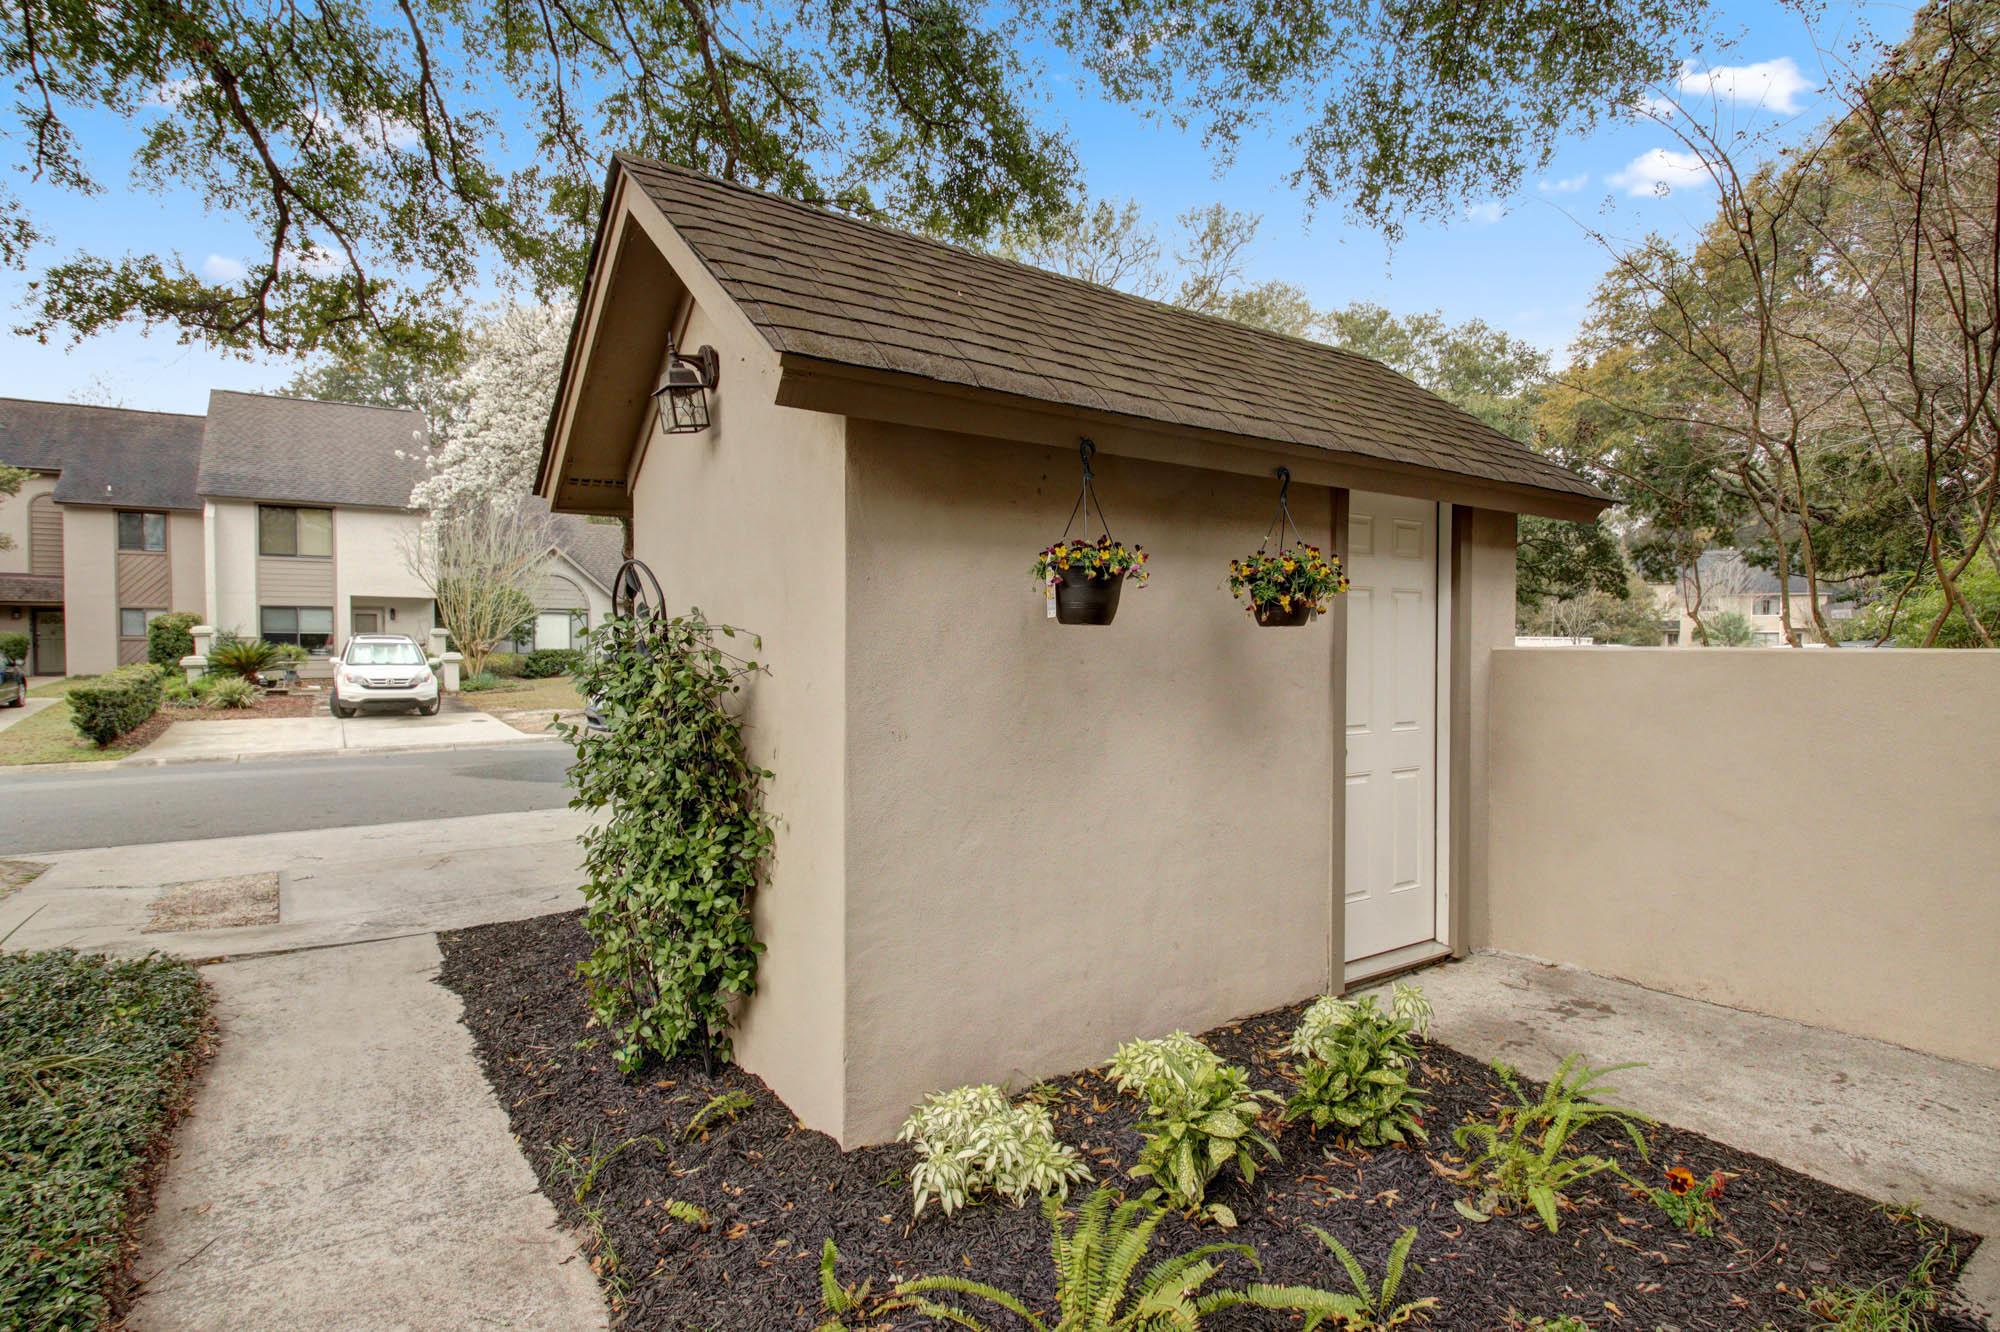 Sandpiper Pointe Homes For Sale - 335 Spoonbill, Mount Pleasant, SC - 1